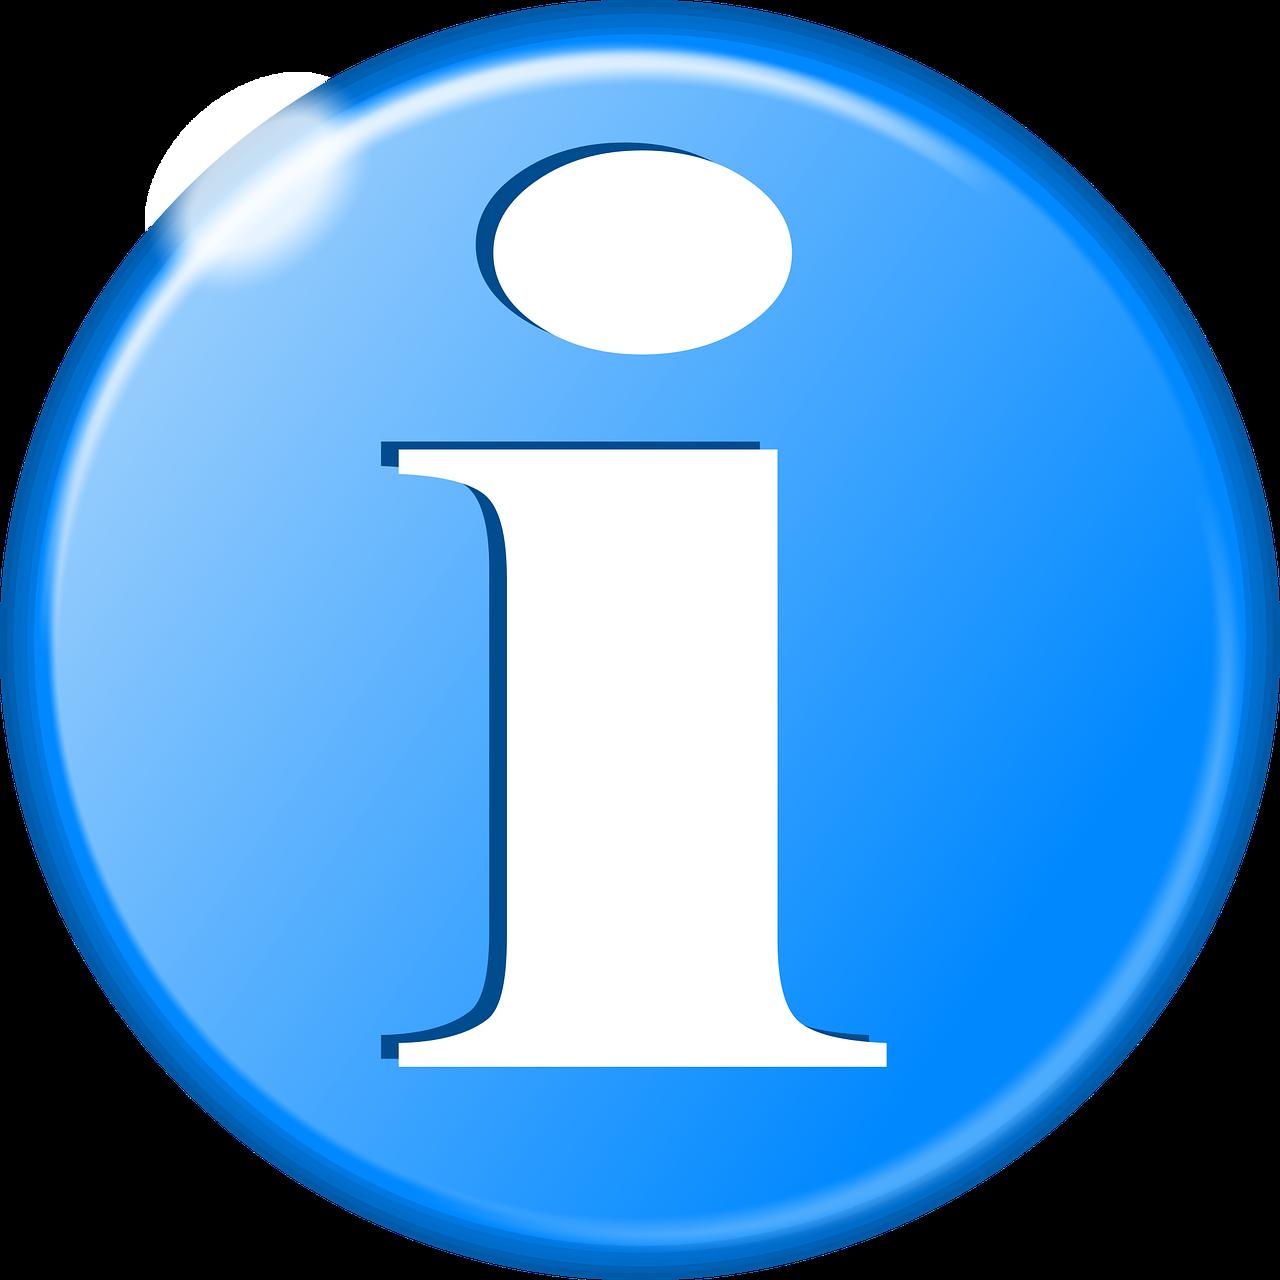 Info Symbol Information - Free image on Pixabay